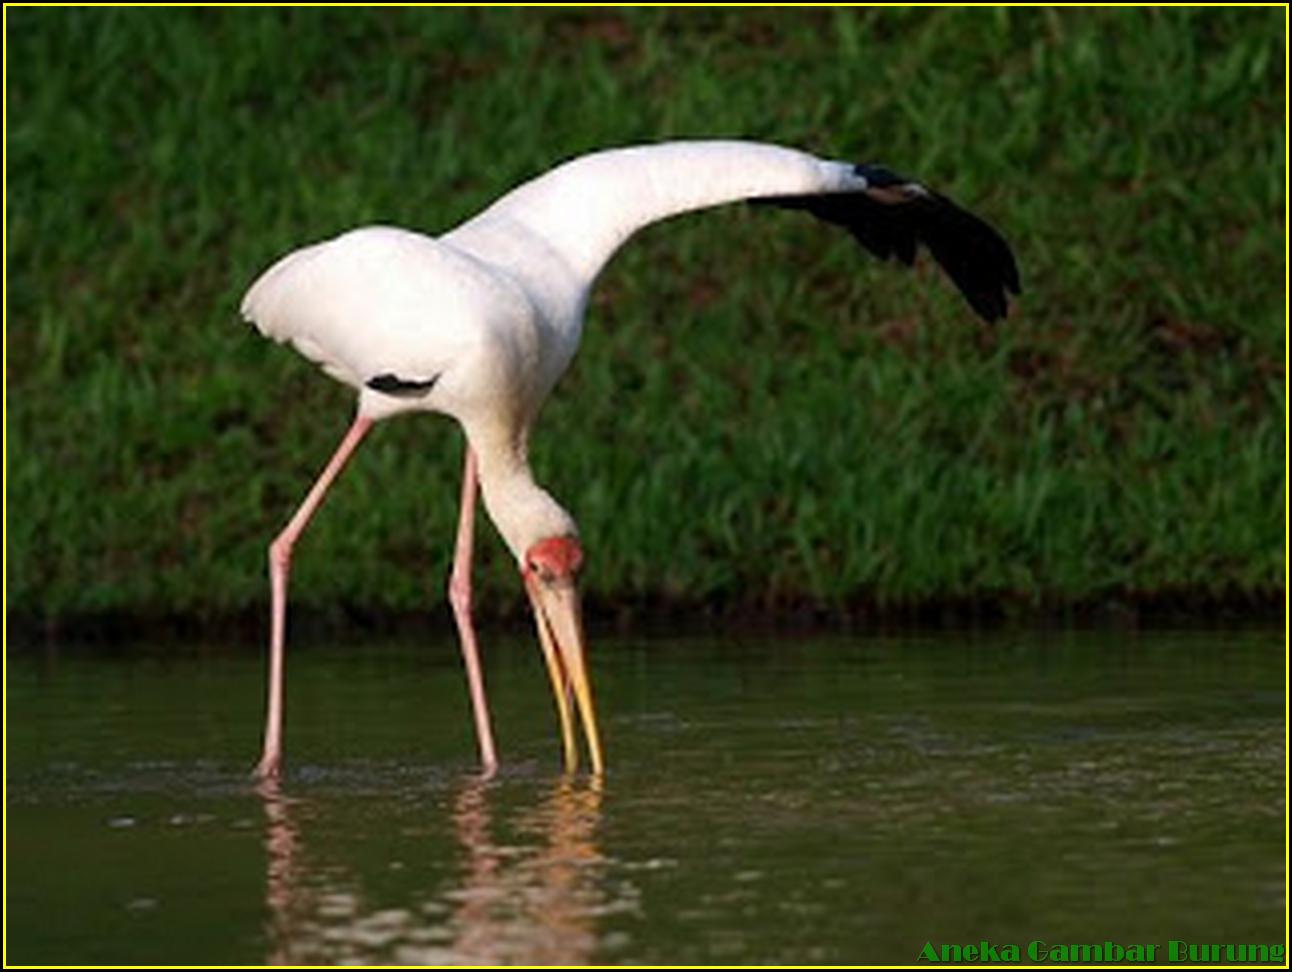 48 Aneka Gambar Burung Bangau Unik Seronok Melayu